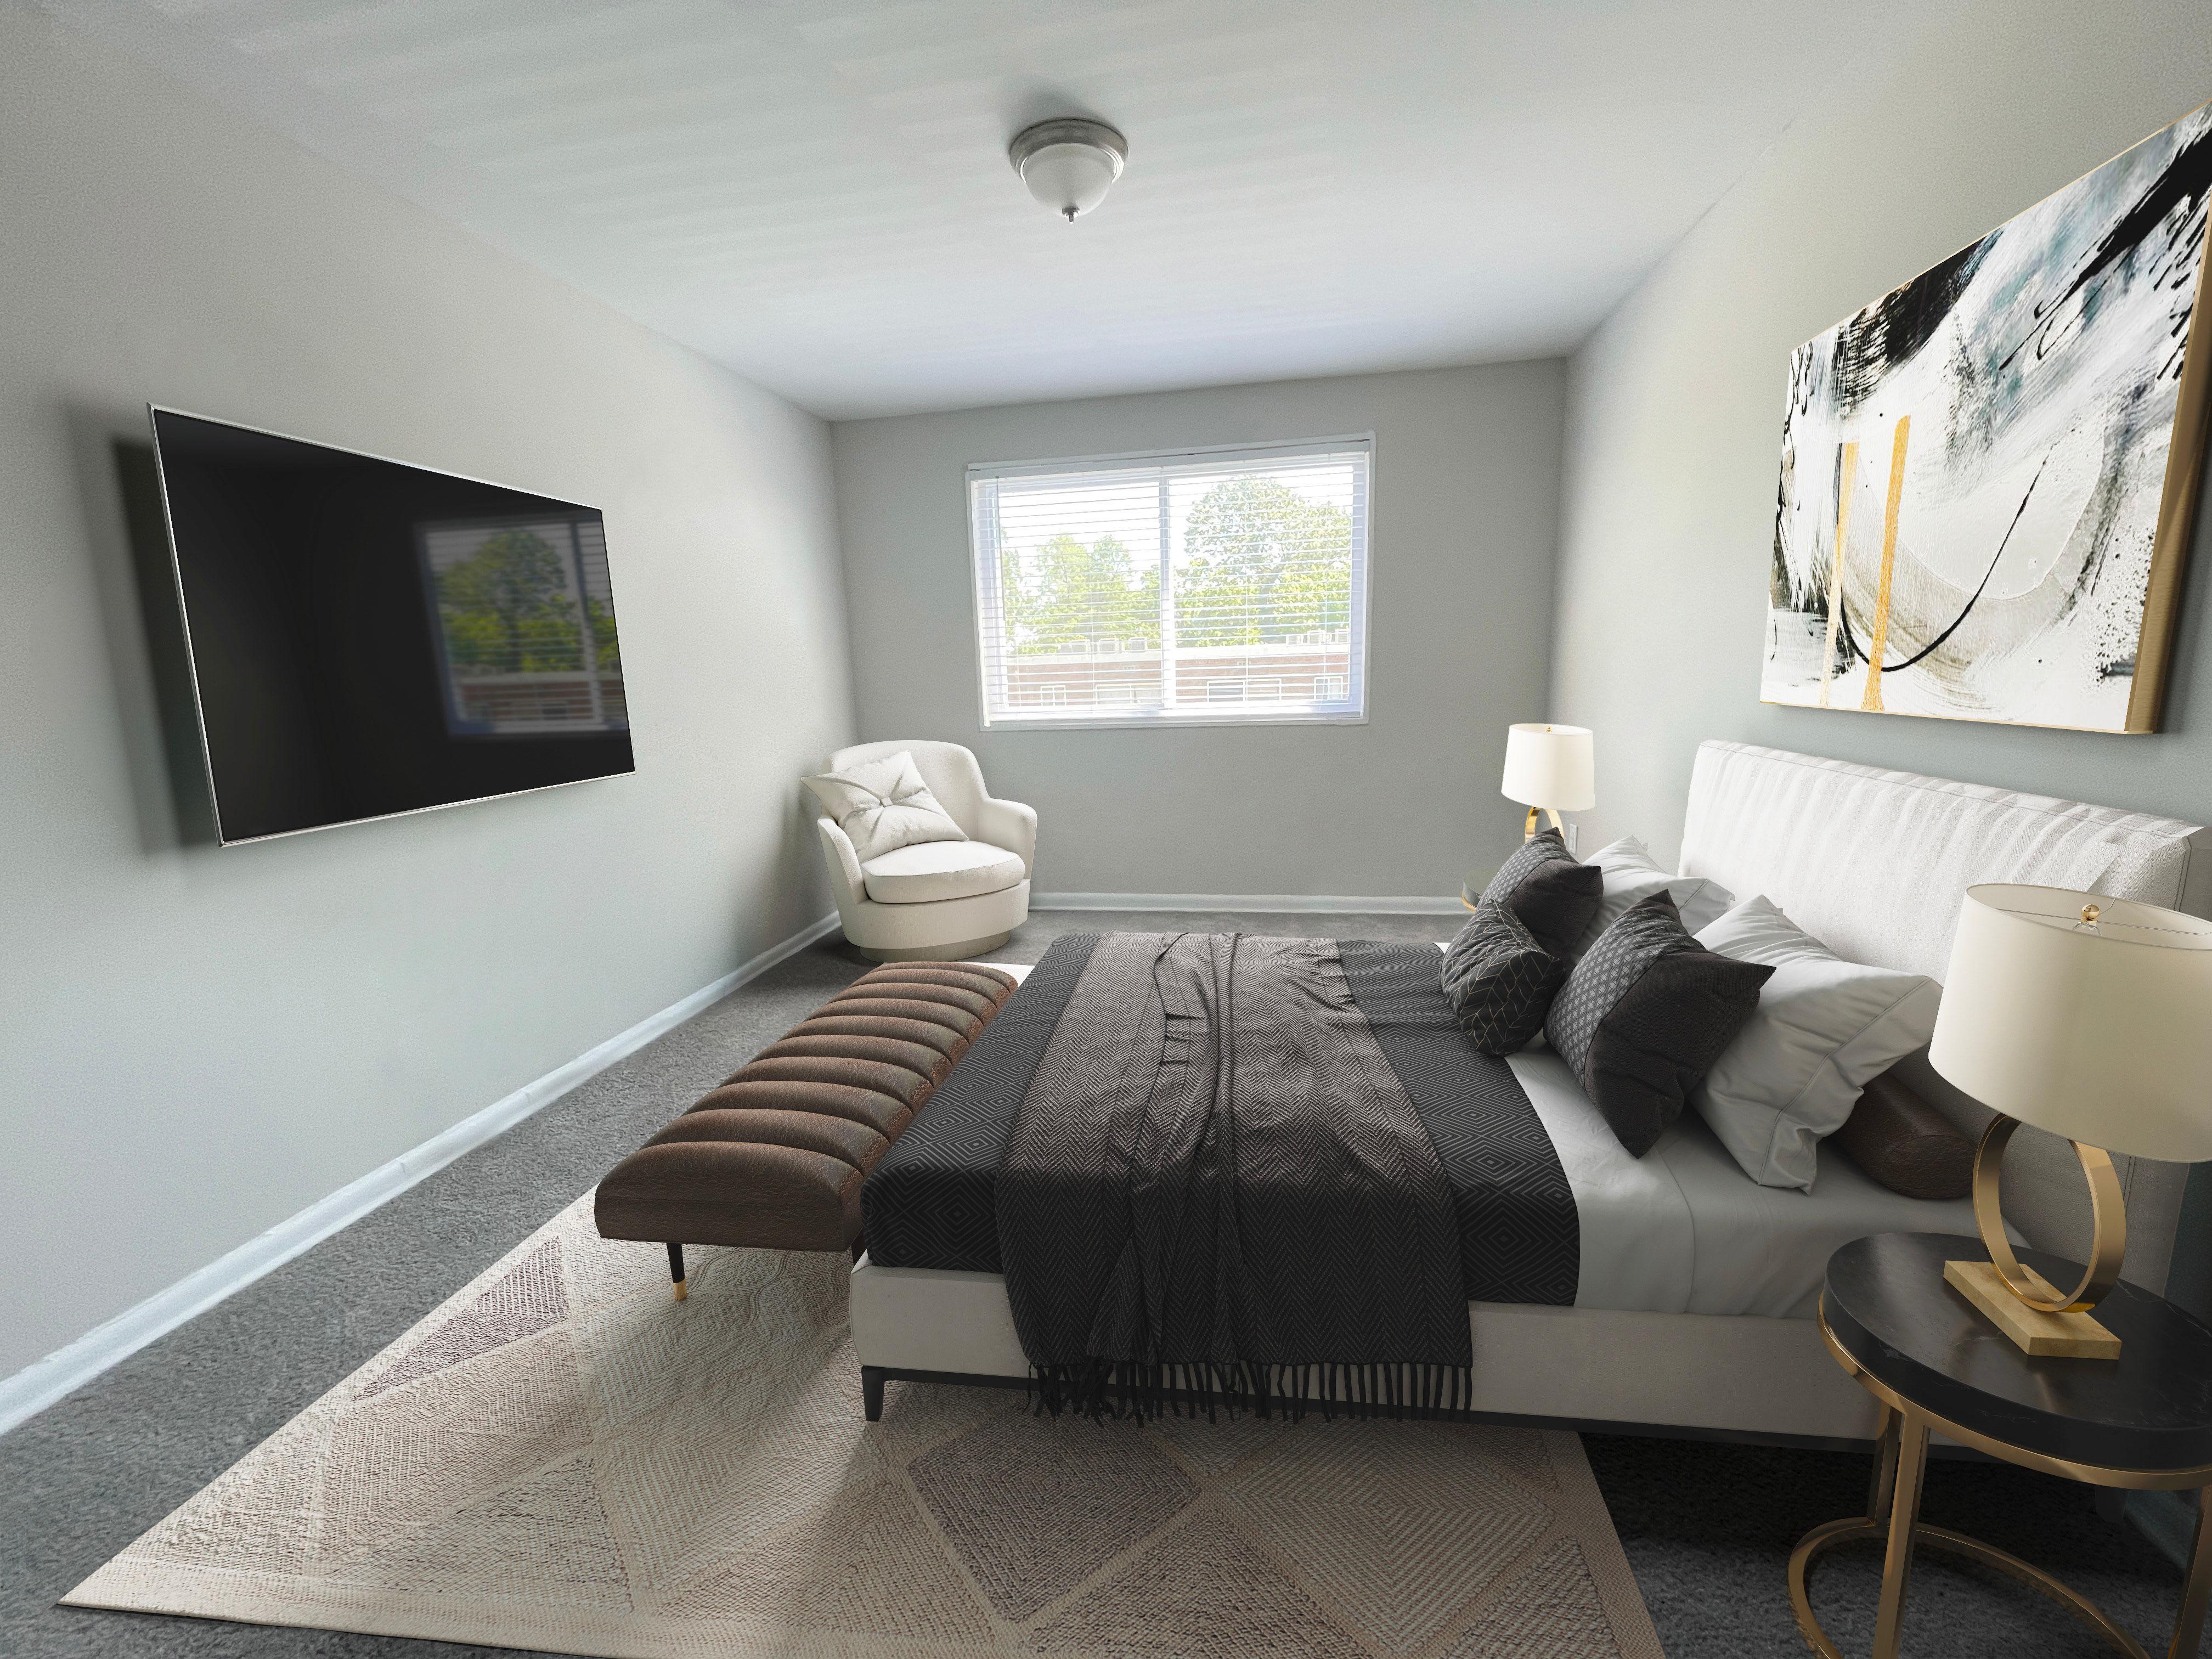 Bedroom shoot with TV in Regency Pointe